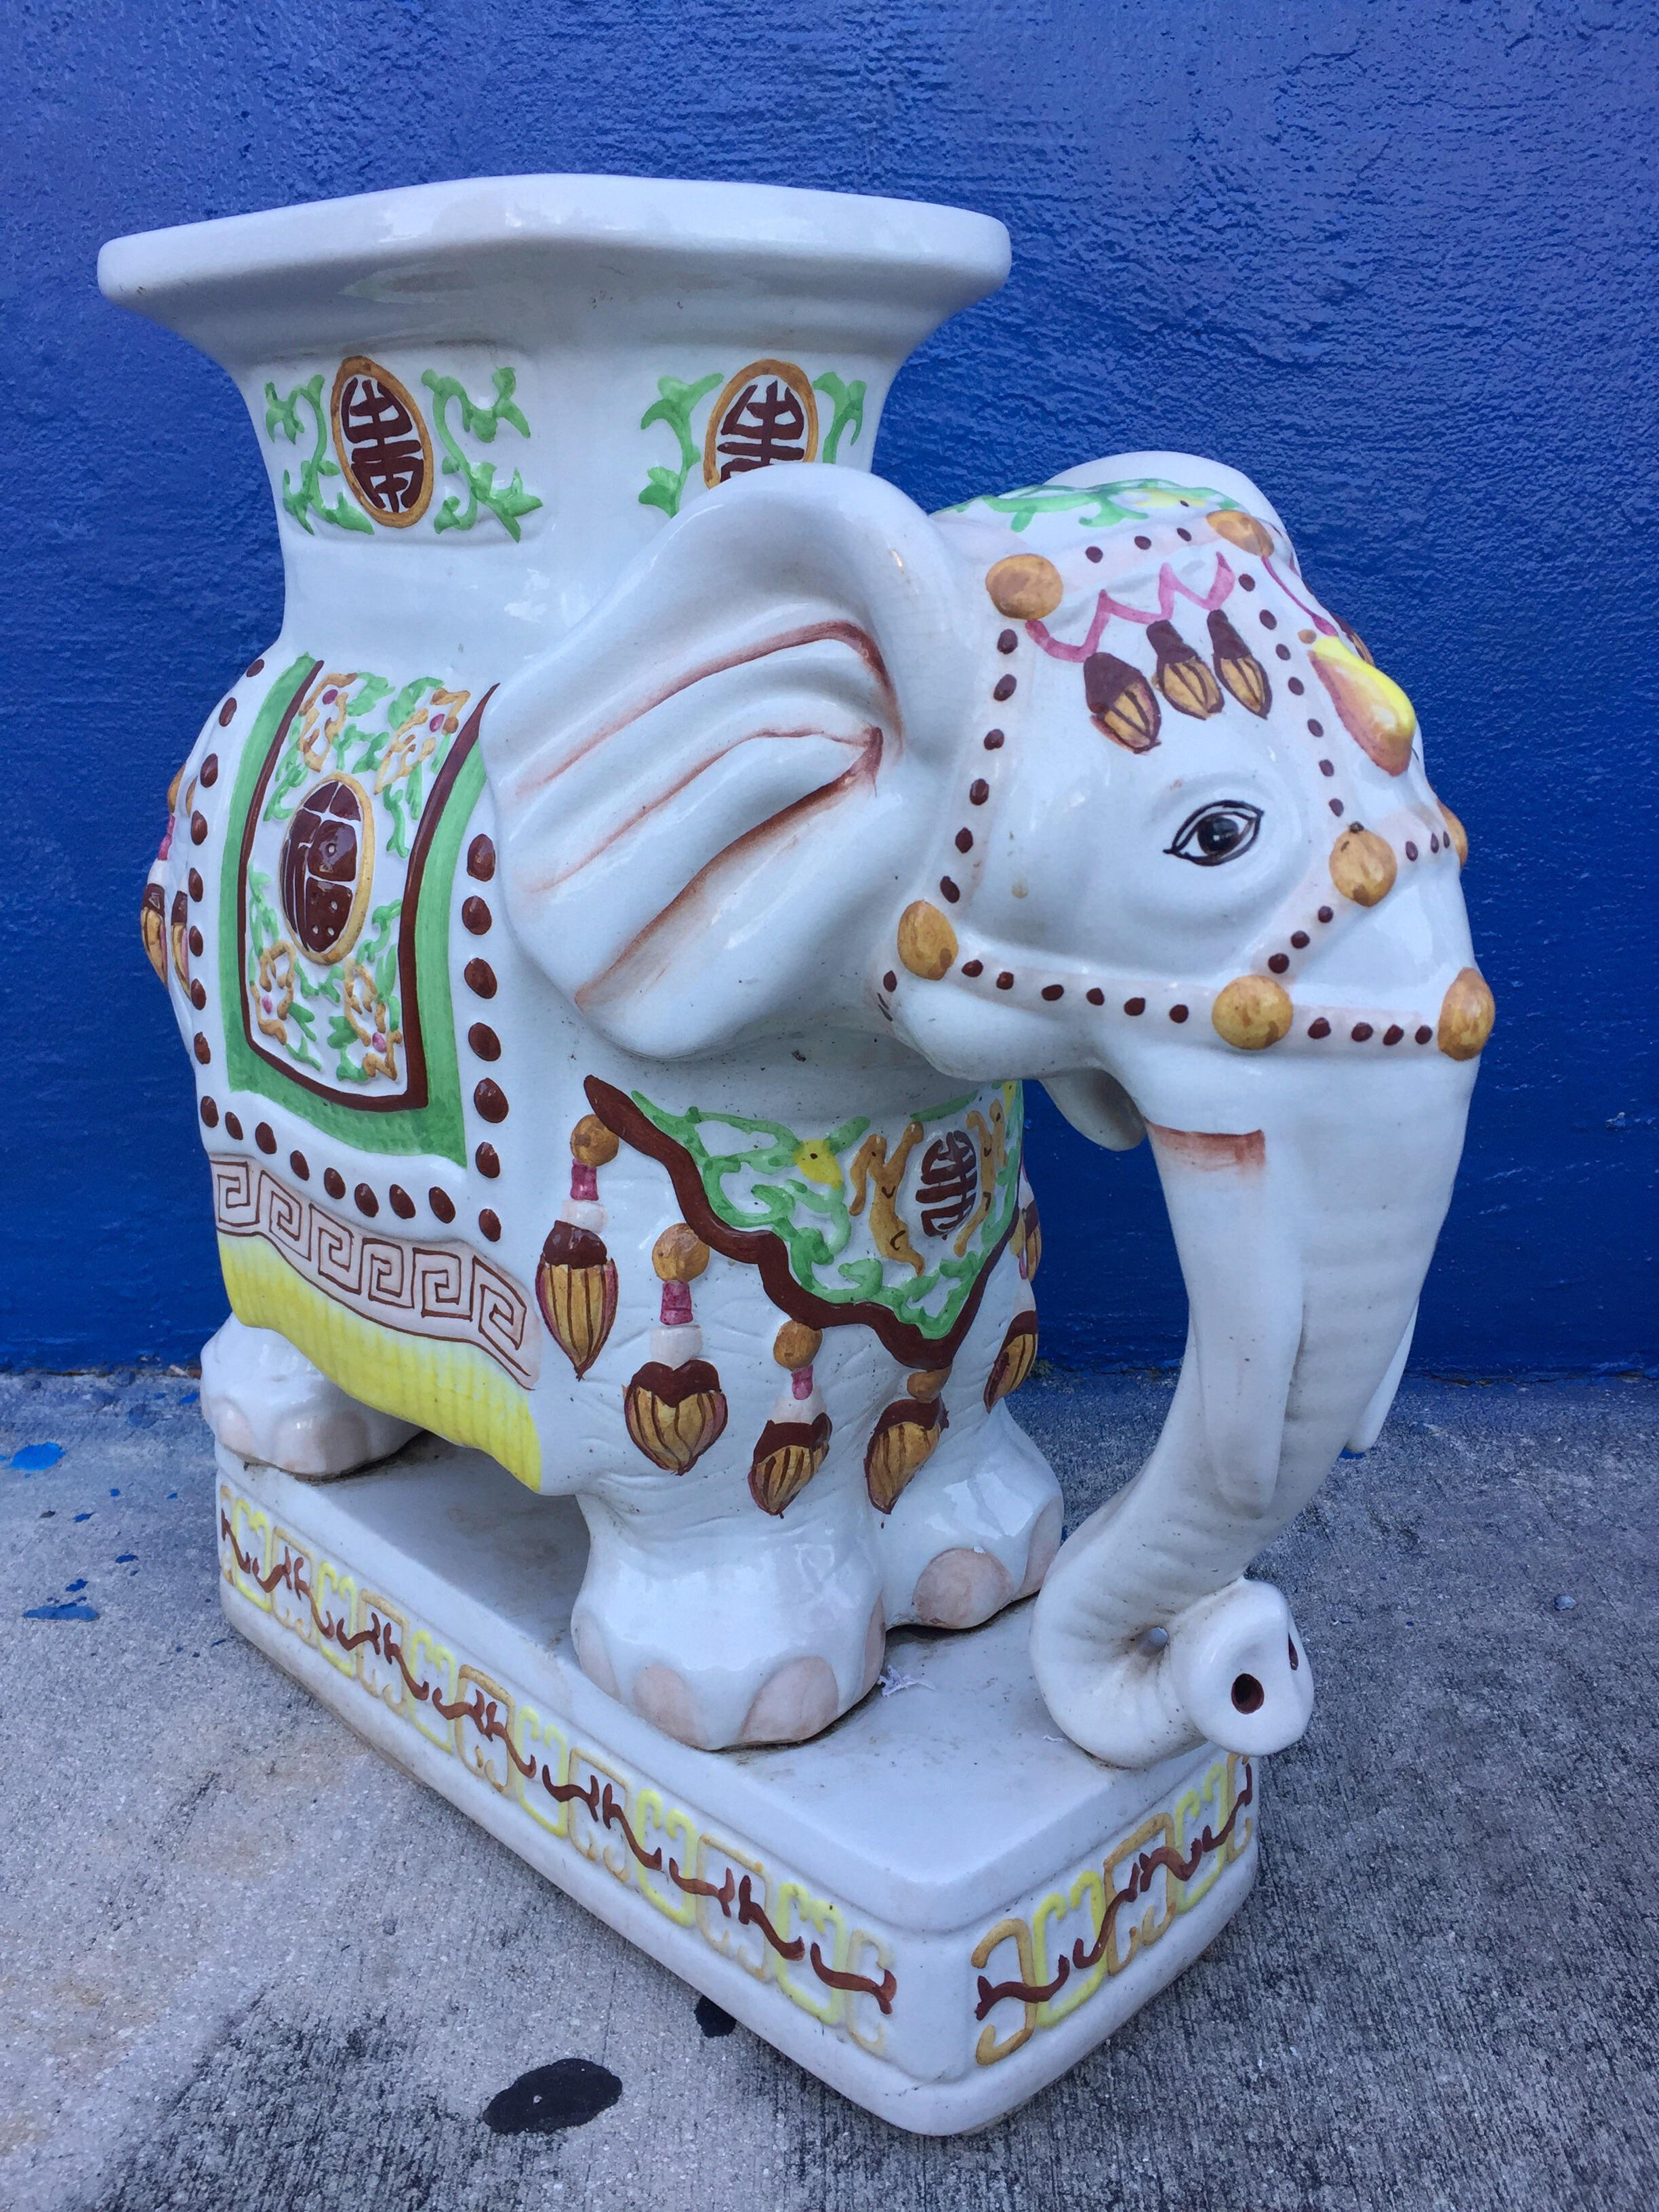 Lovely Vintage Ceramic Elephant Garden Stools #28 - Vintage Ceramic Elephant Garden Stool - Image 9 Of 11